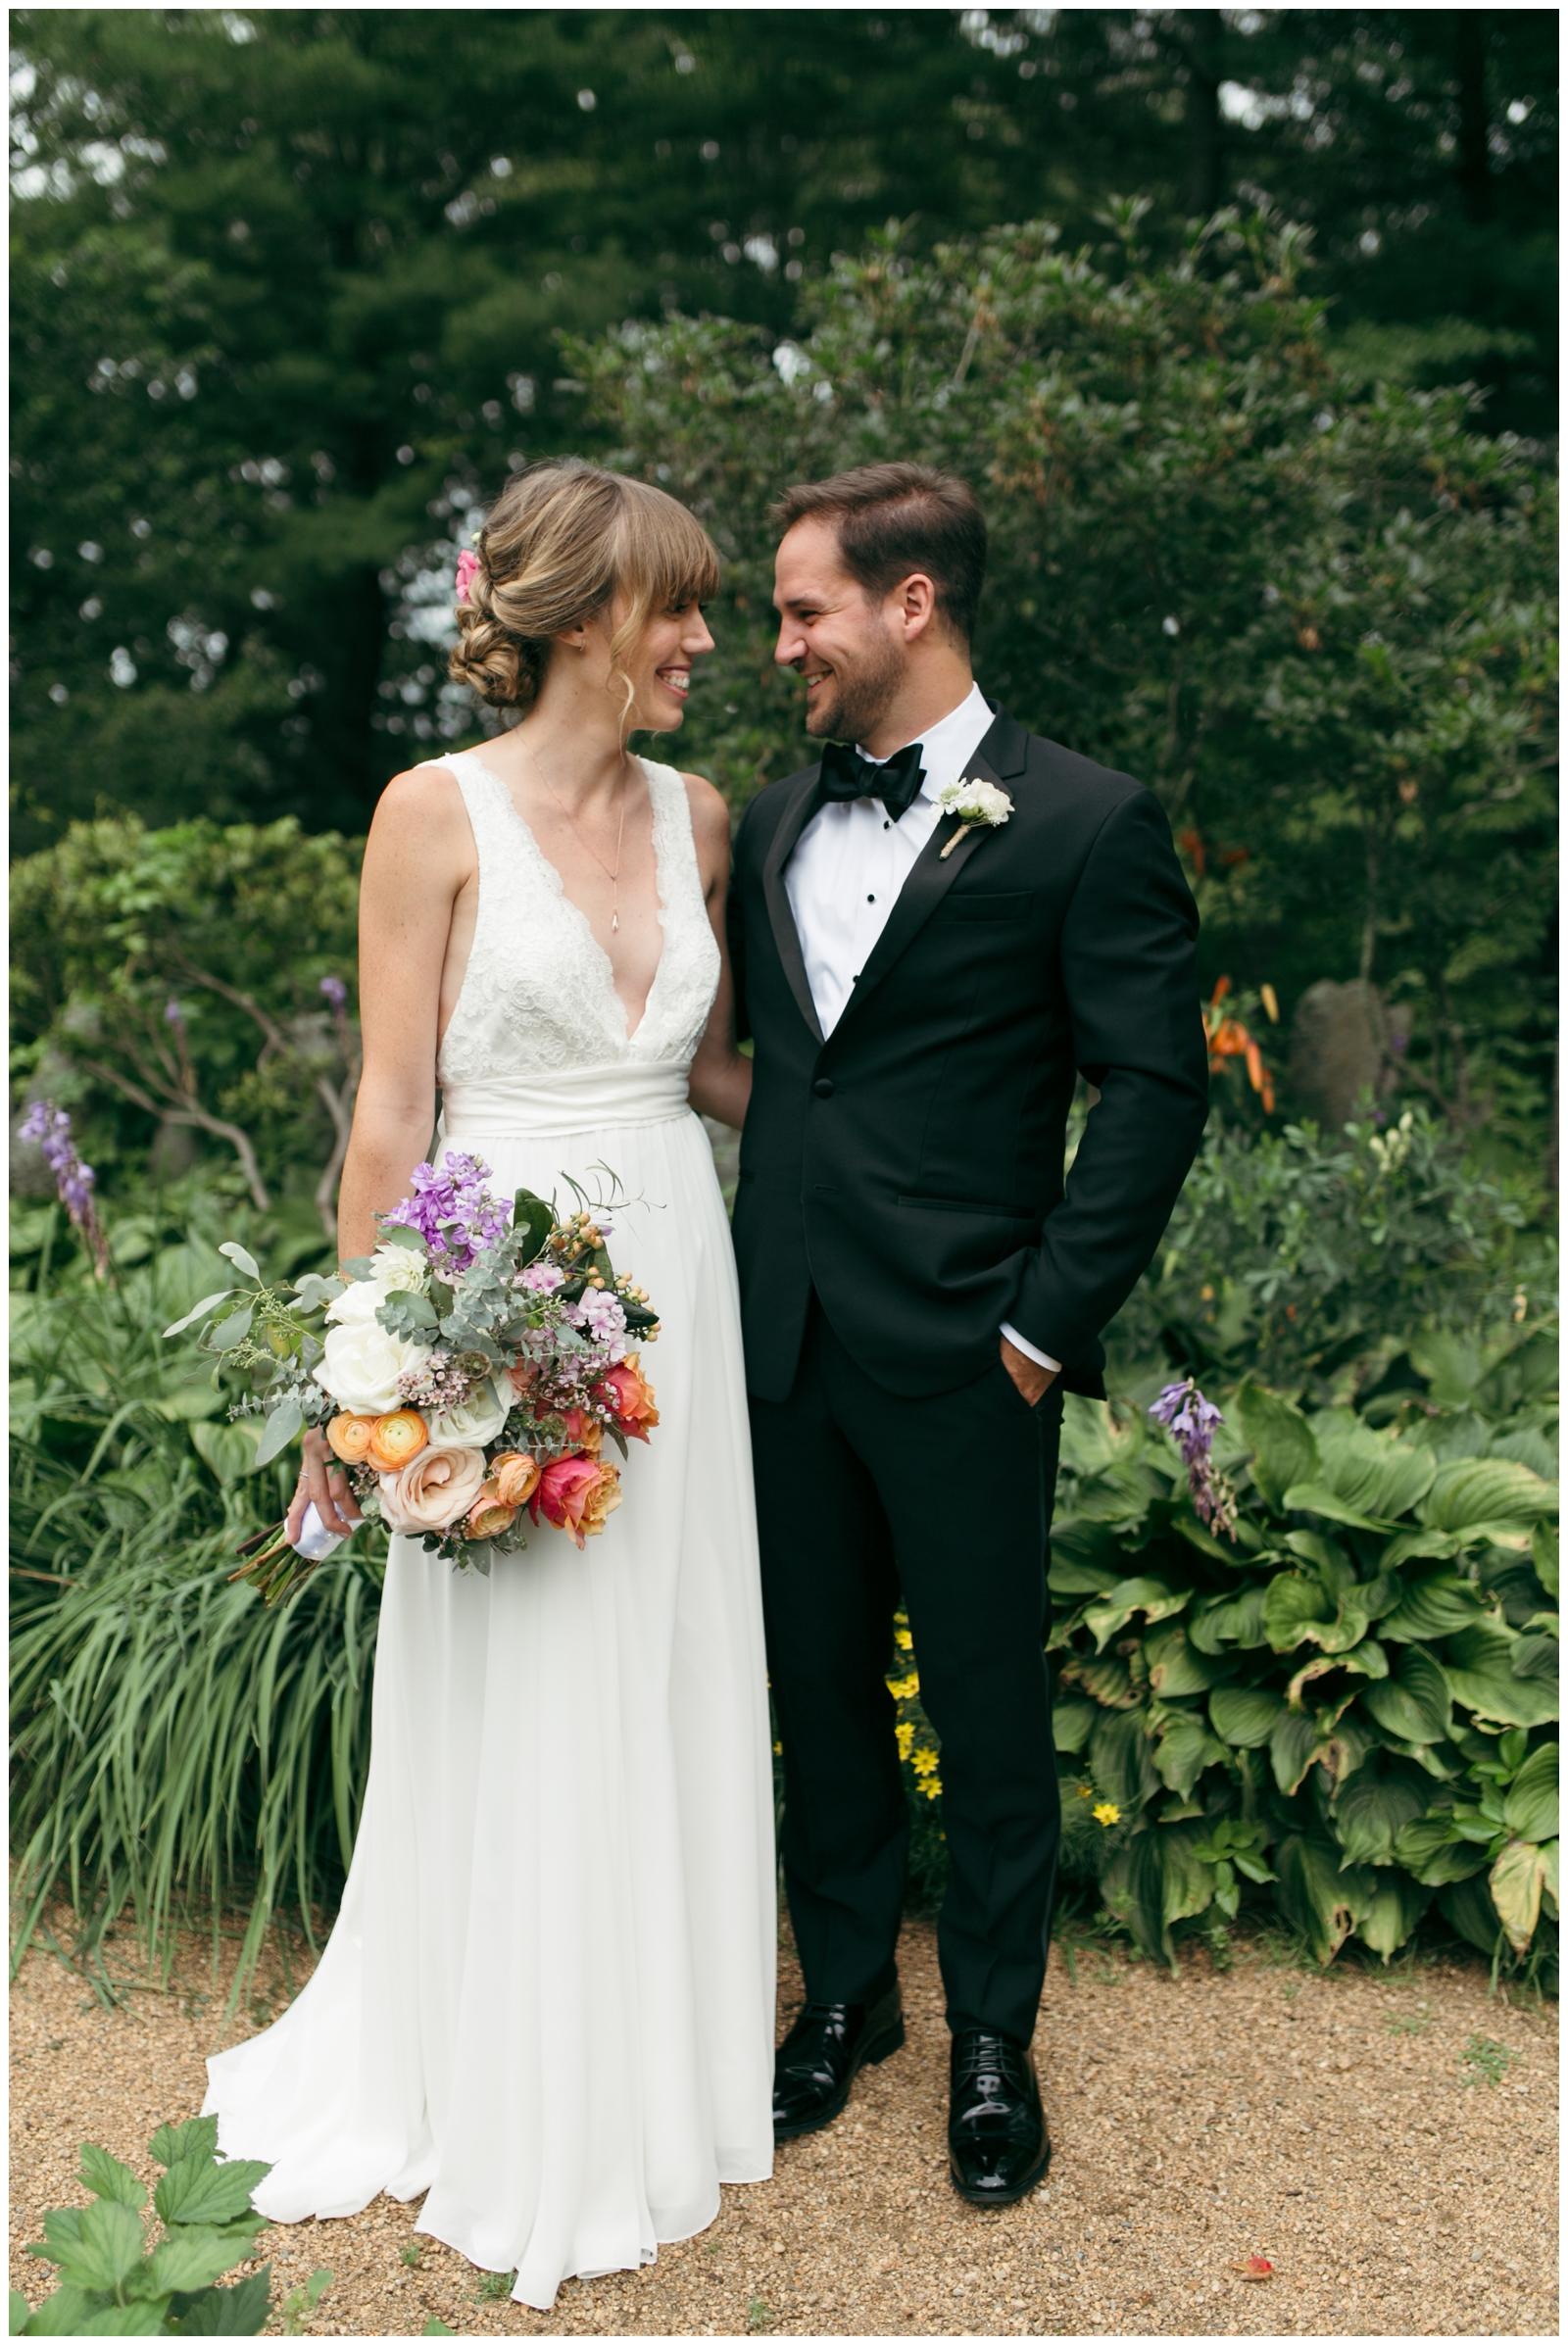 Moraine-Farm-wedding-Bailey-Q-Photo-Massachusetts-wedding-photpgrapher-022.jpg